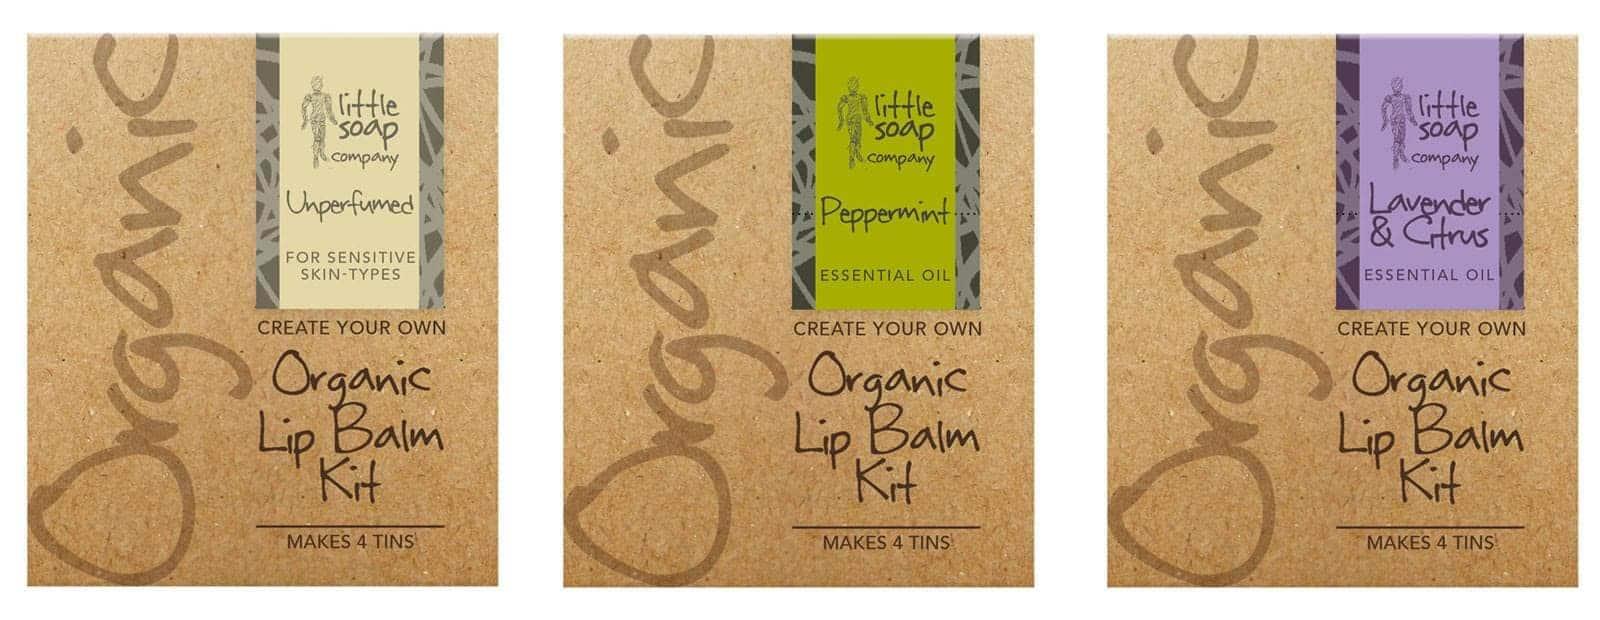 Introducing Three Little Lip Balm Kits_LittleSoapCompany.co.uk